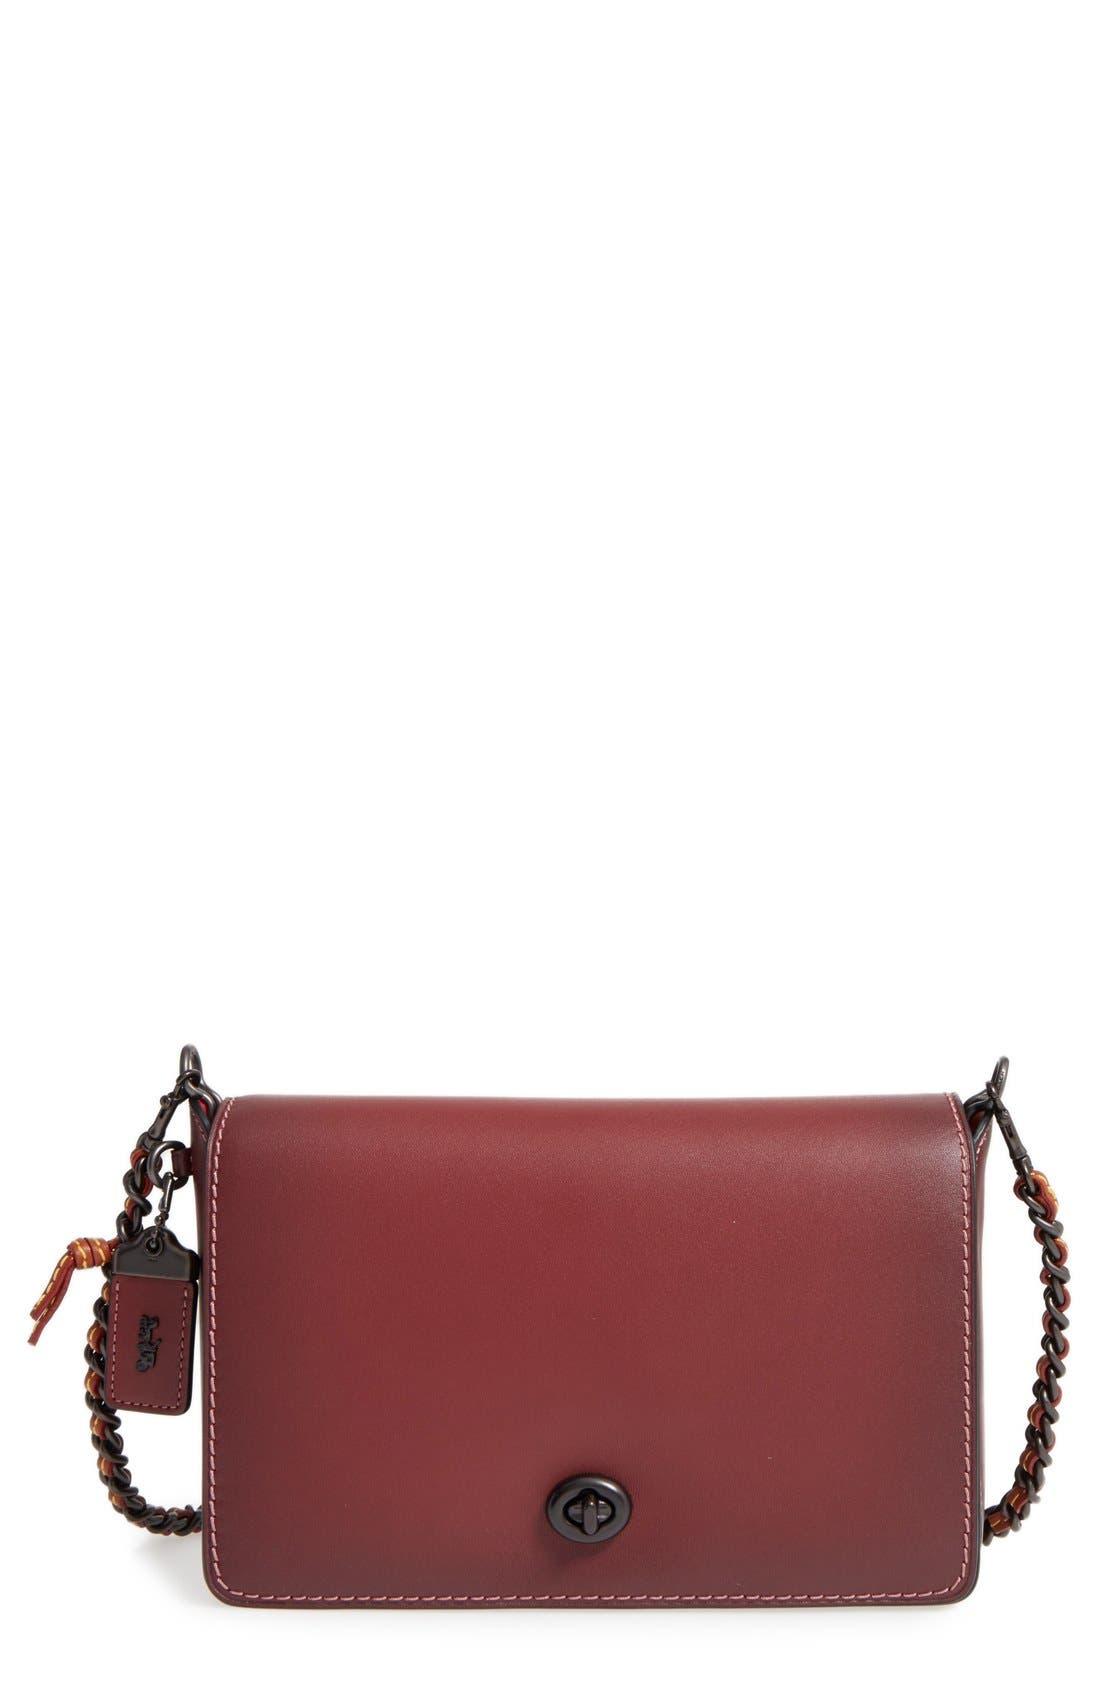 COACH 1941 'Dinky 24' Leather Crossbody Bag